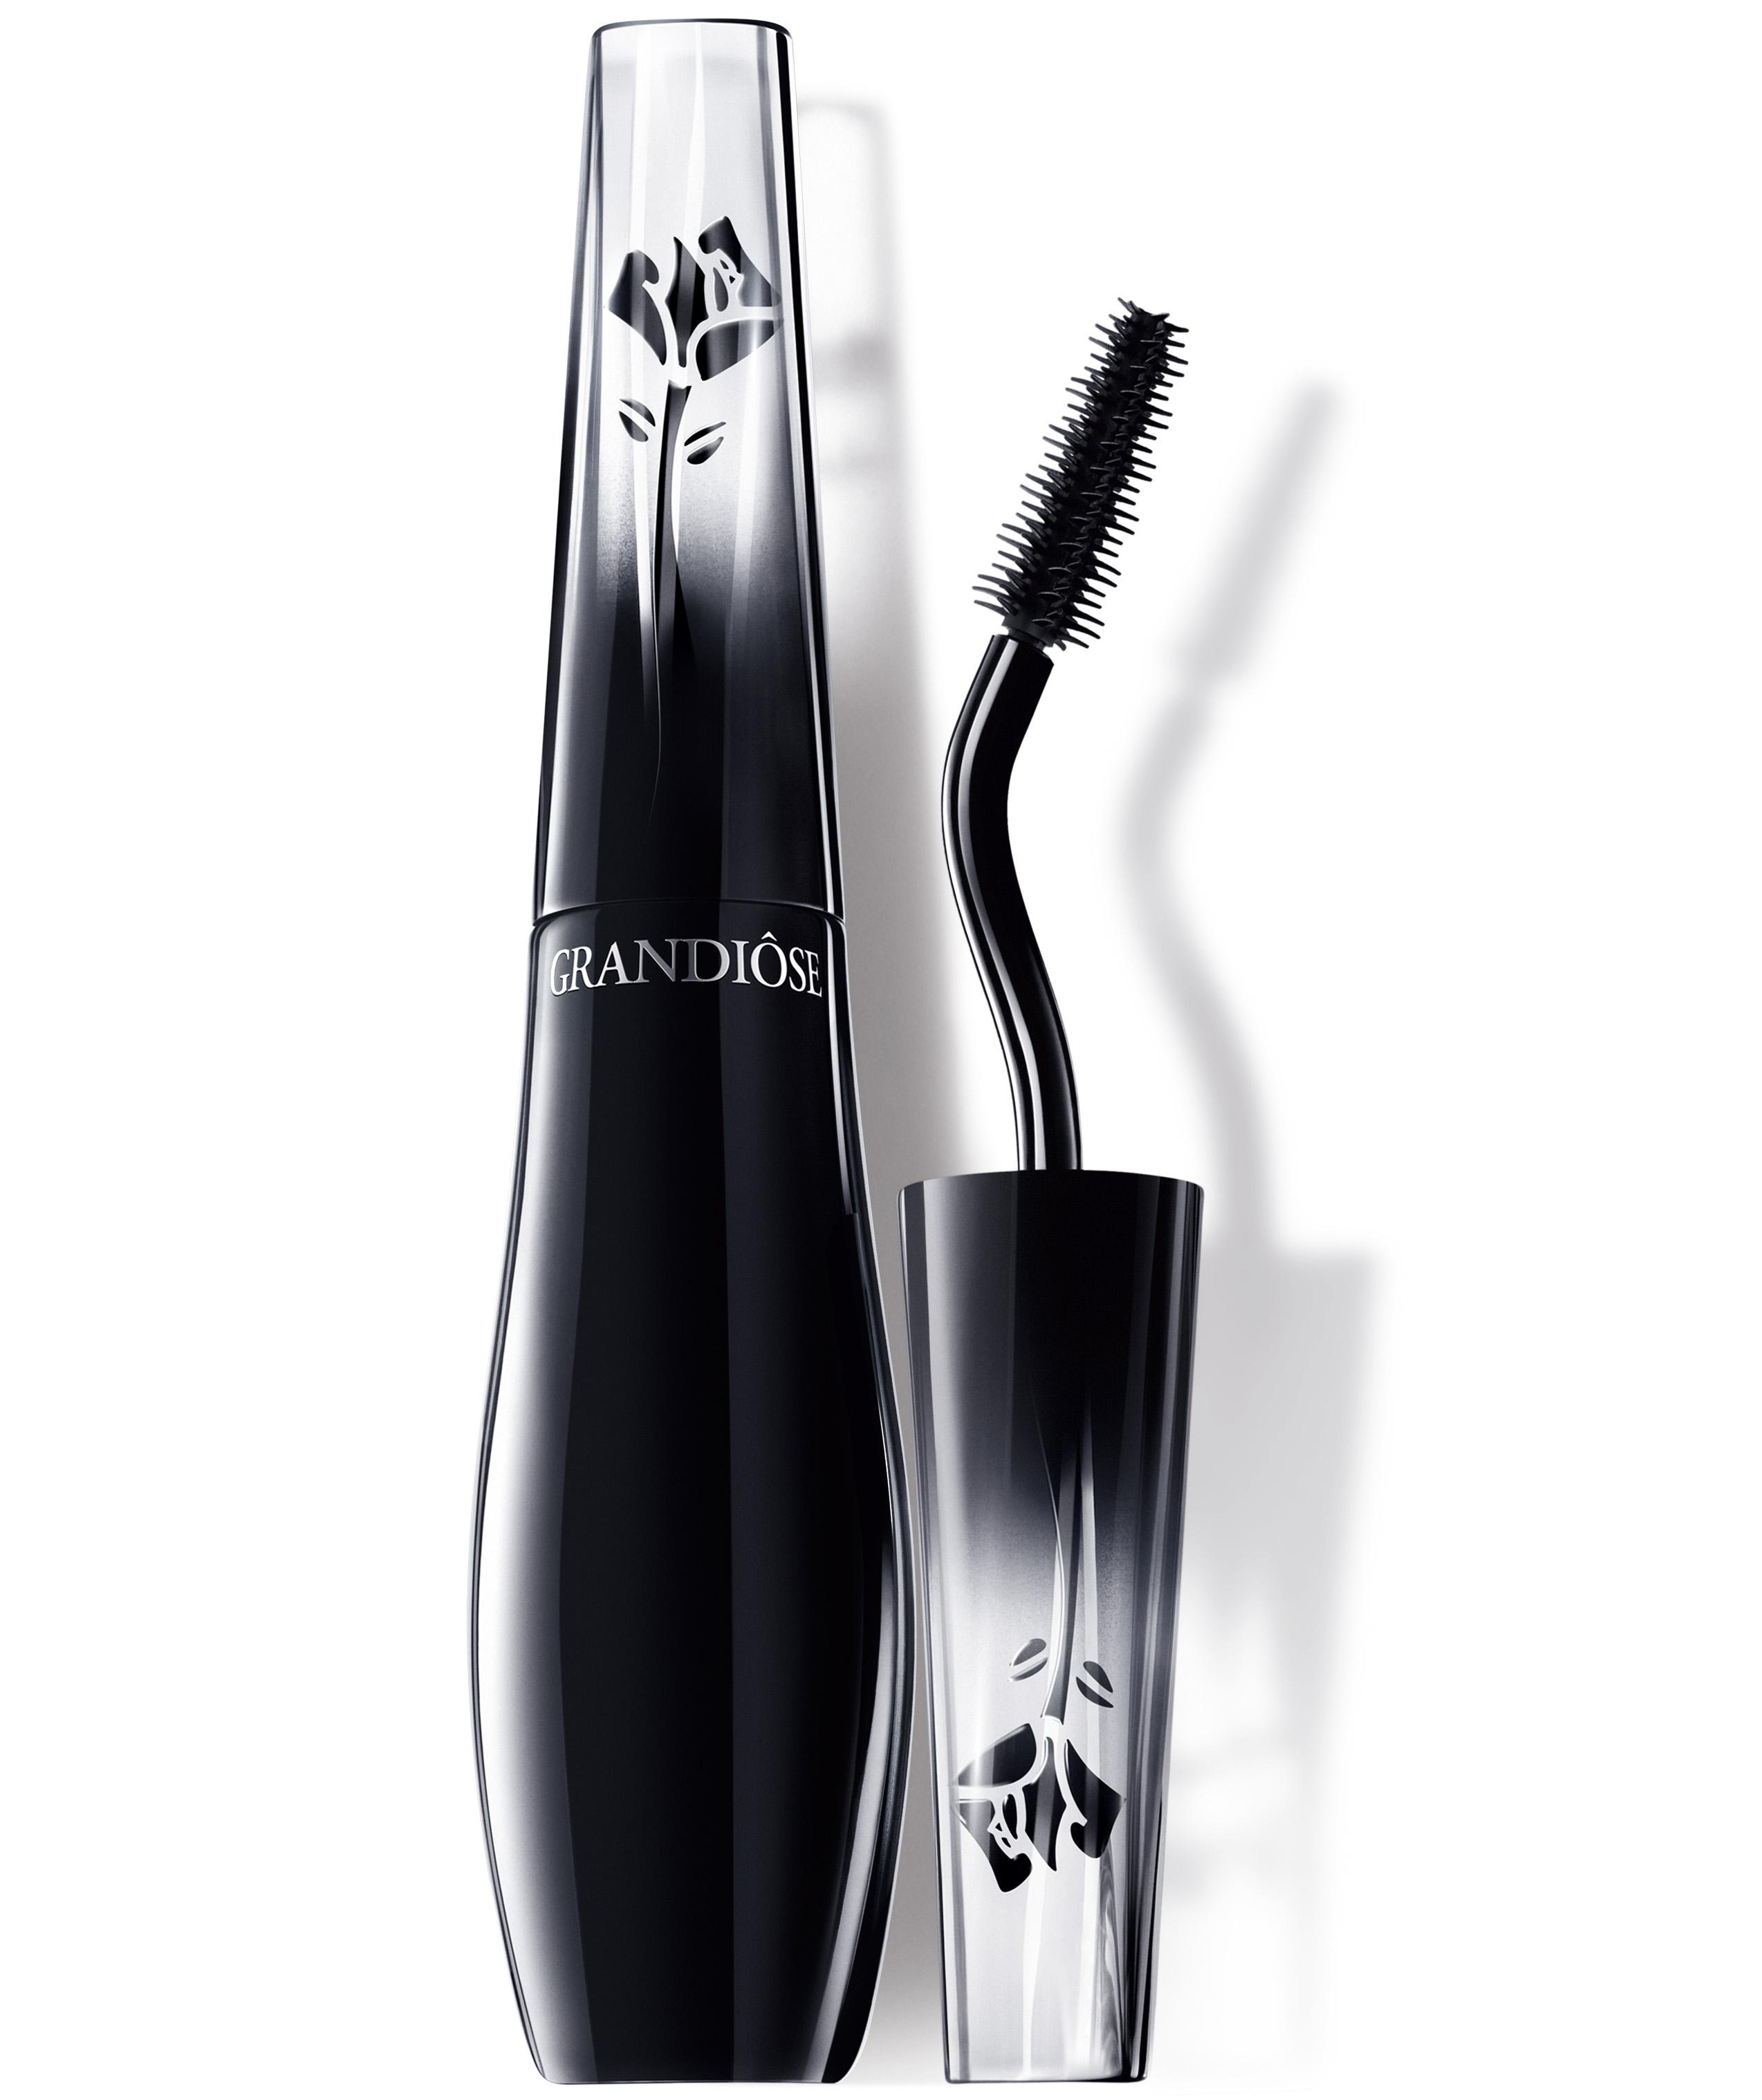 Lancome-Grandiose-mascara-1.jpg